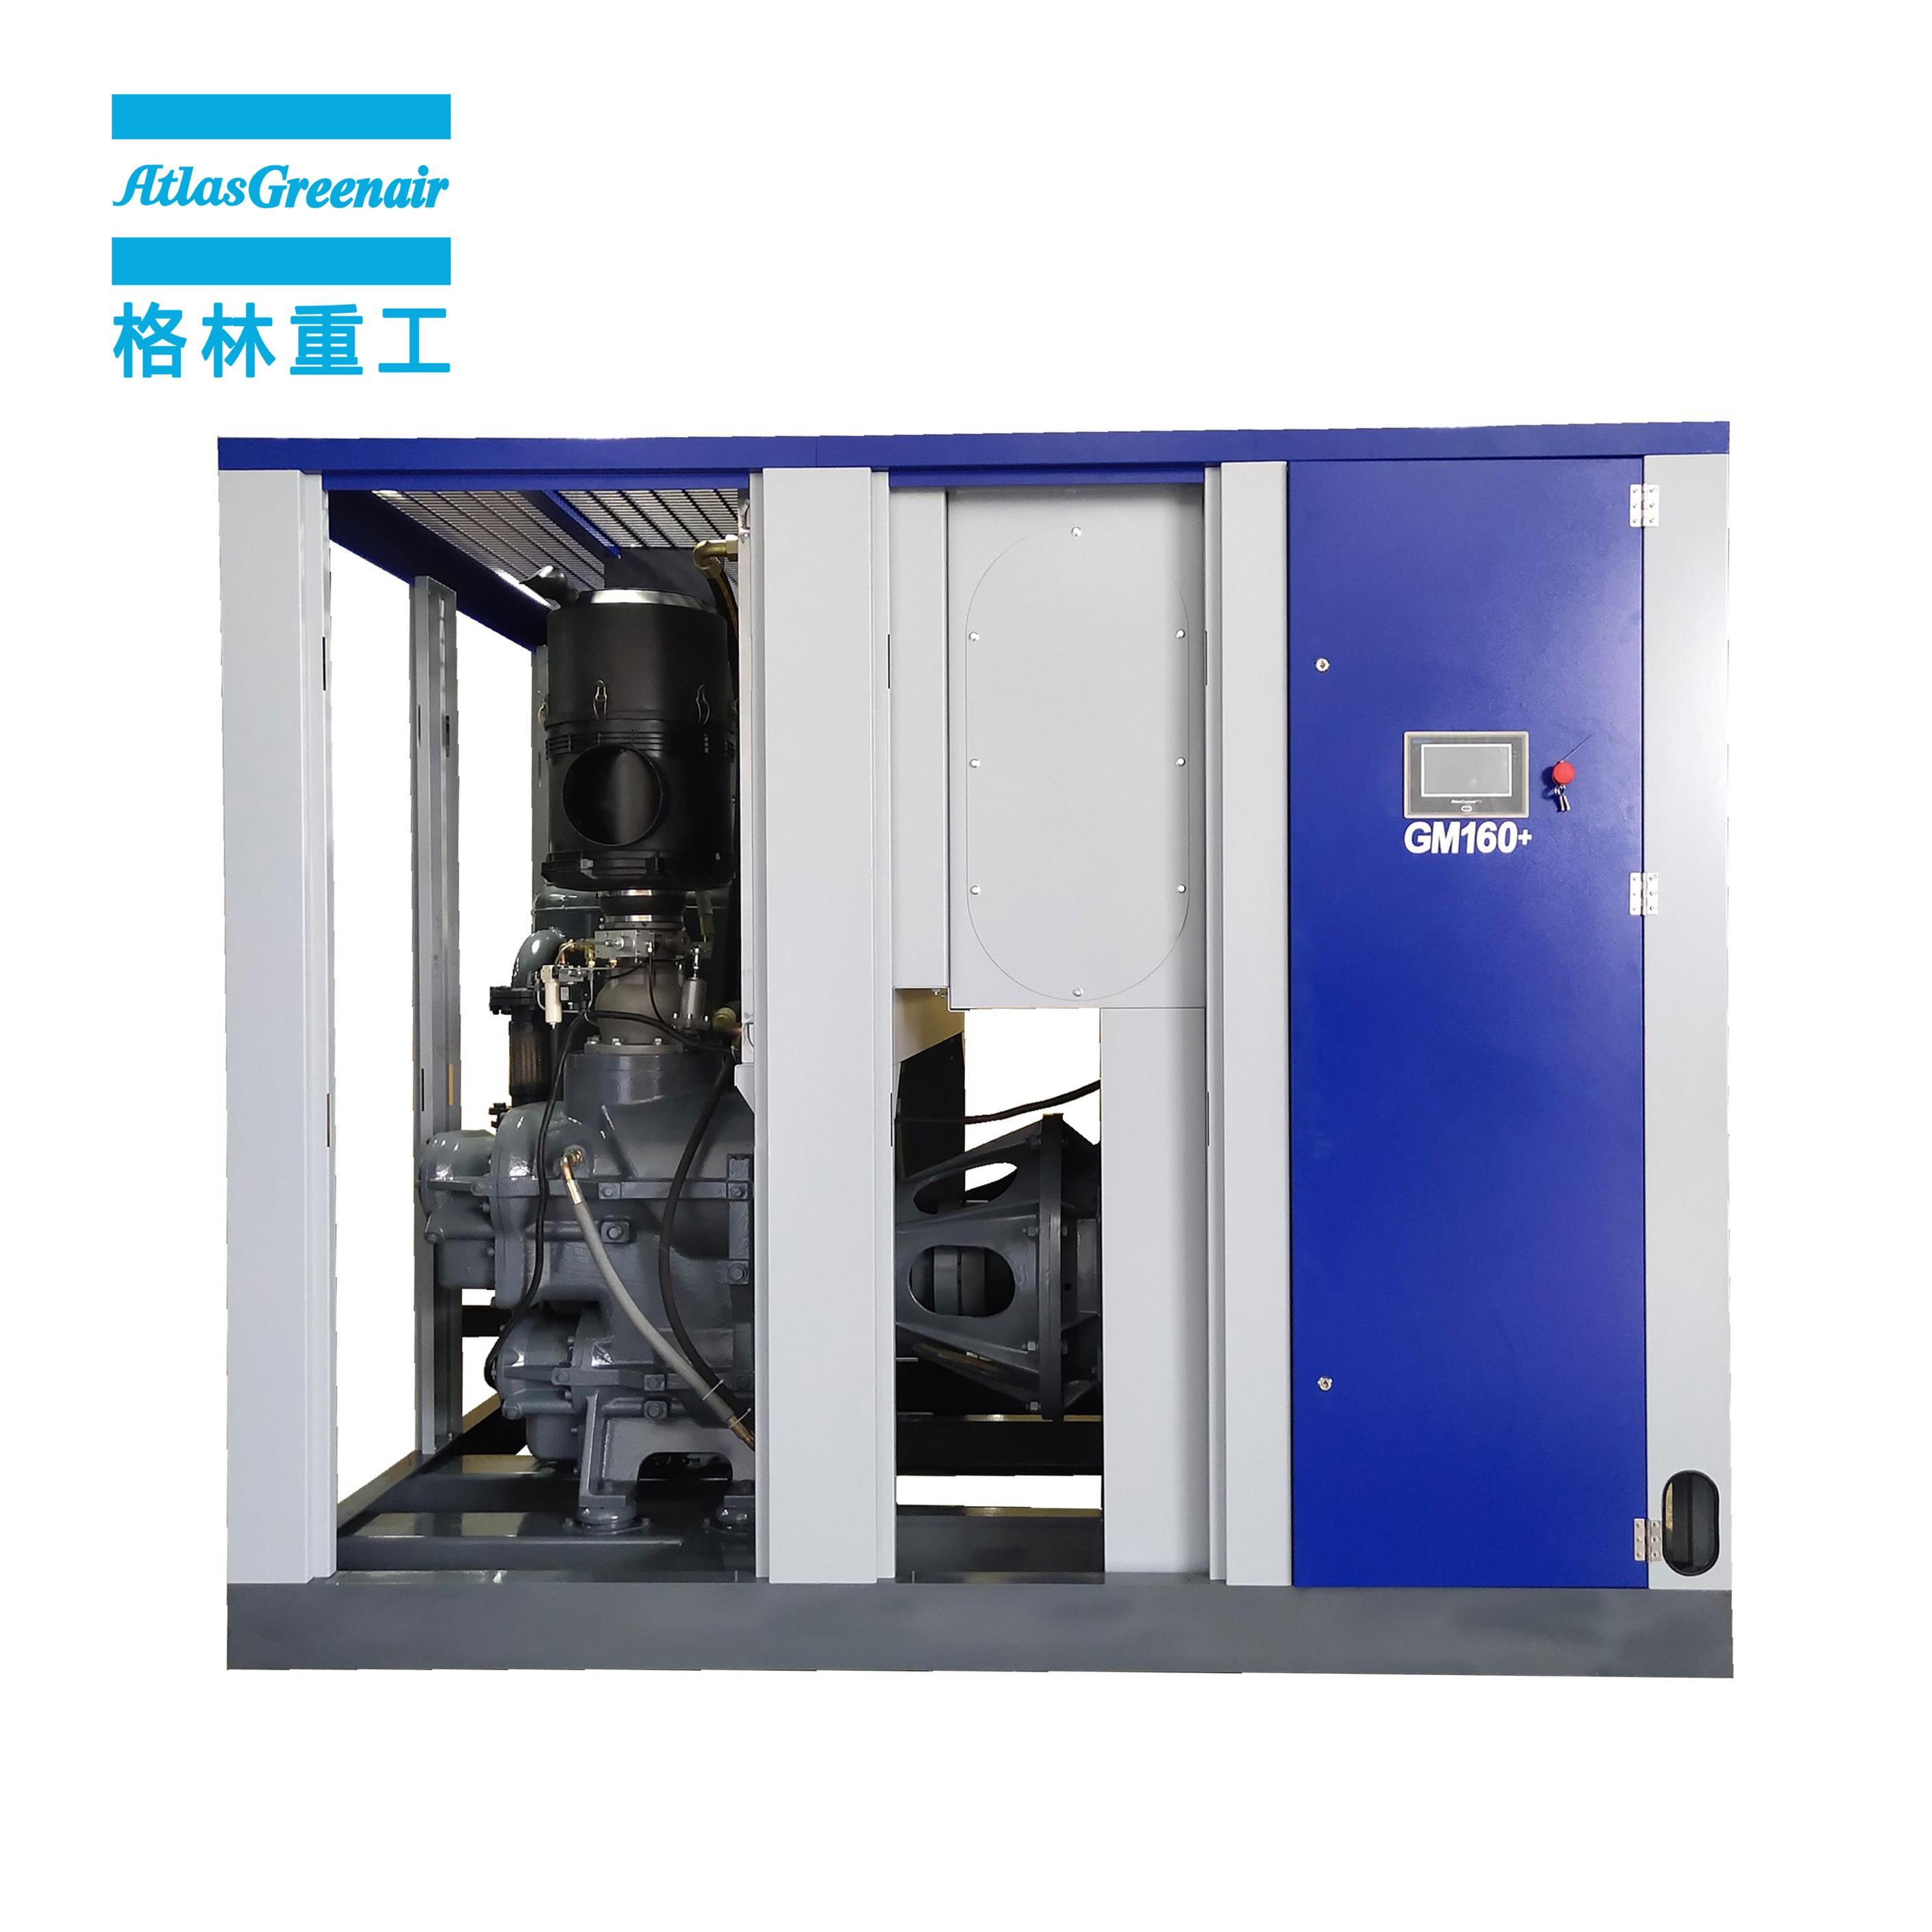 Atlas Greenair Screw Air Compressor cheap variable speed air compressor with a single air compressor for sale-2